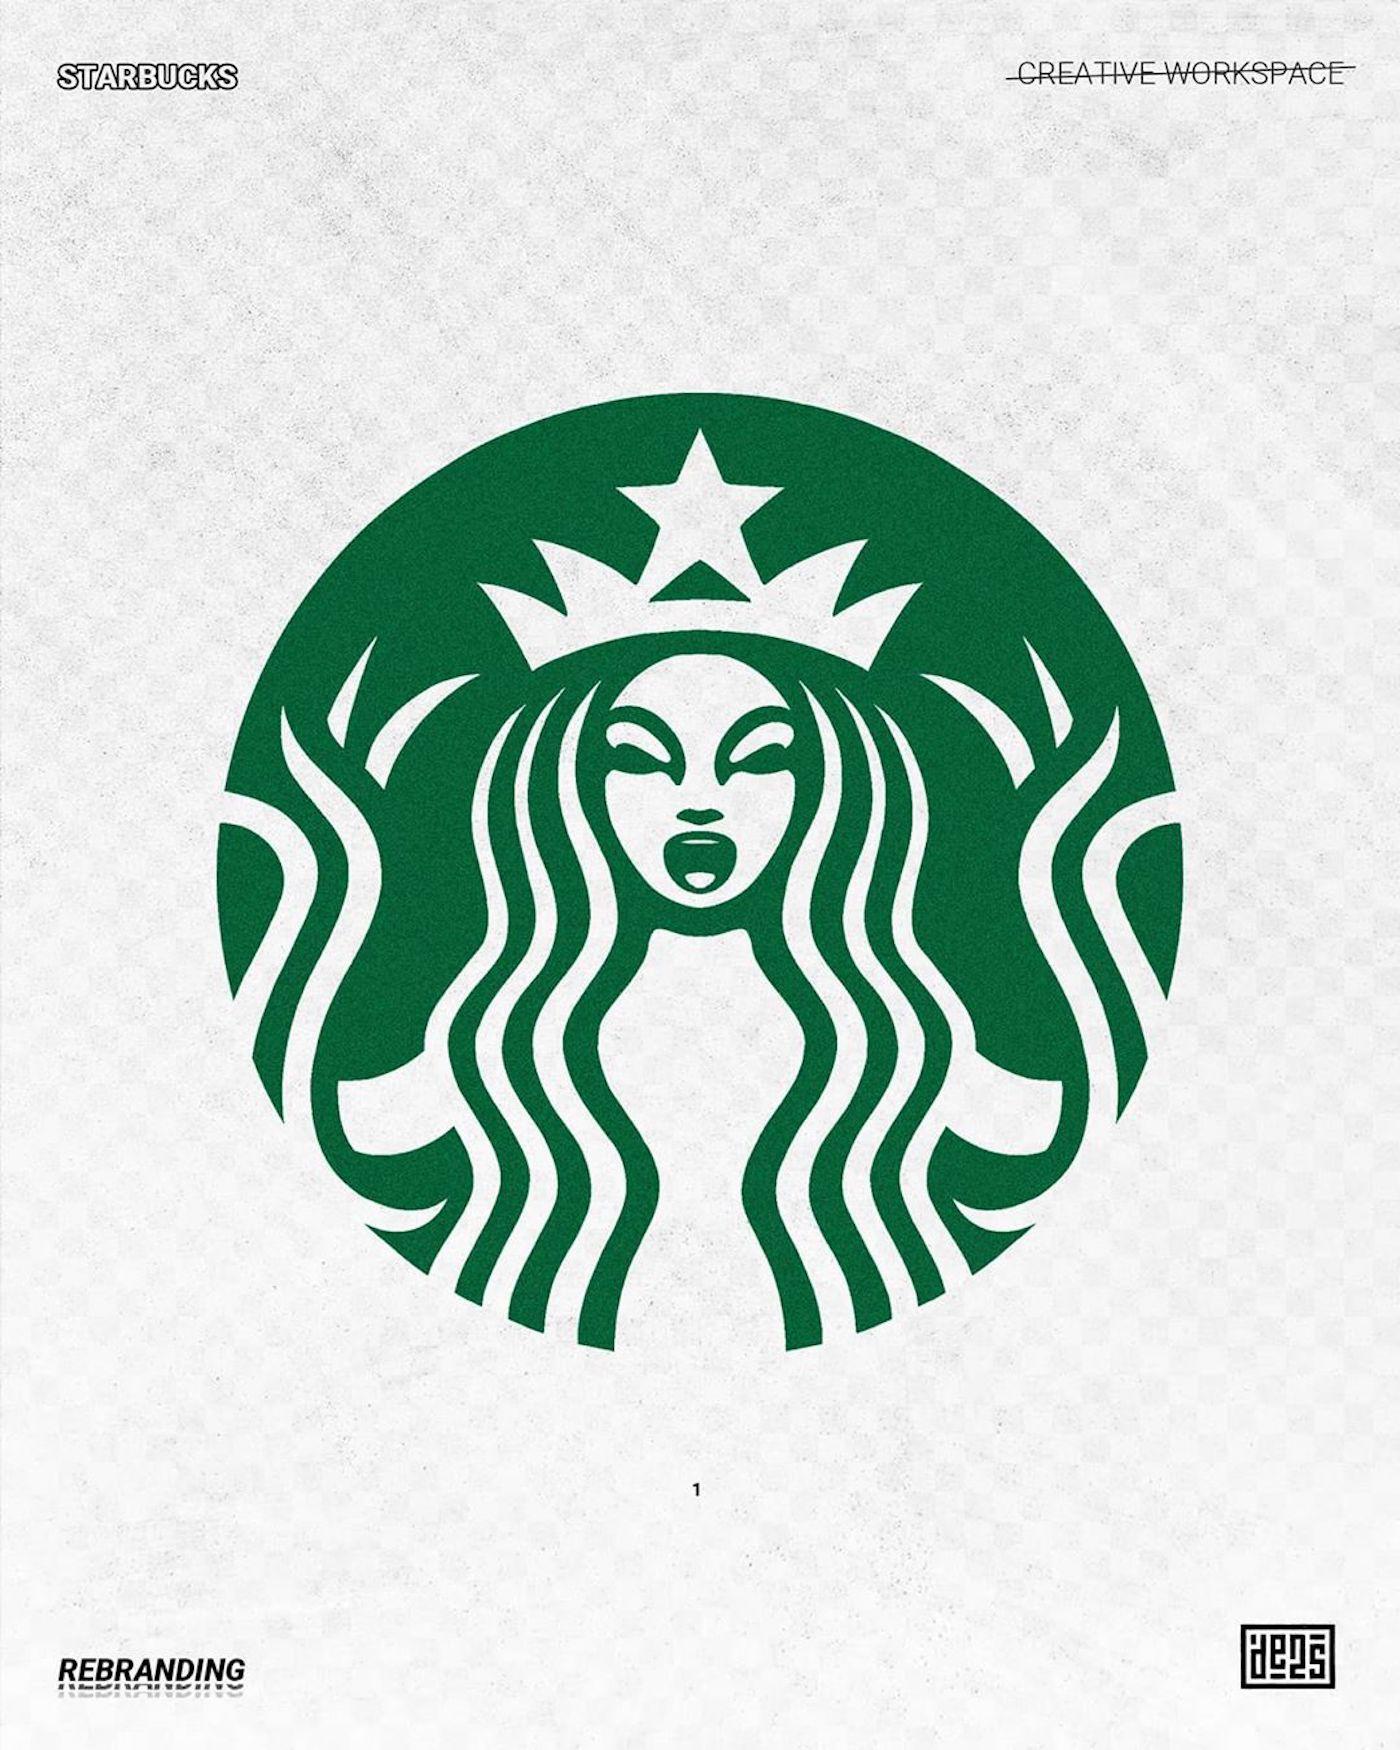 Logo de Starbucks rebrandé par de2s